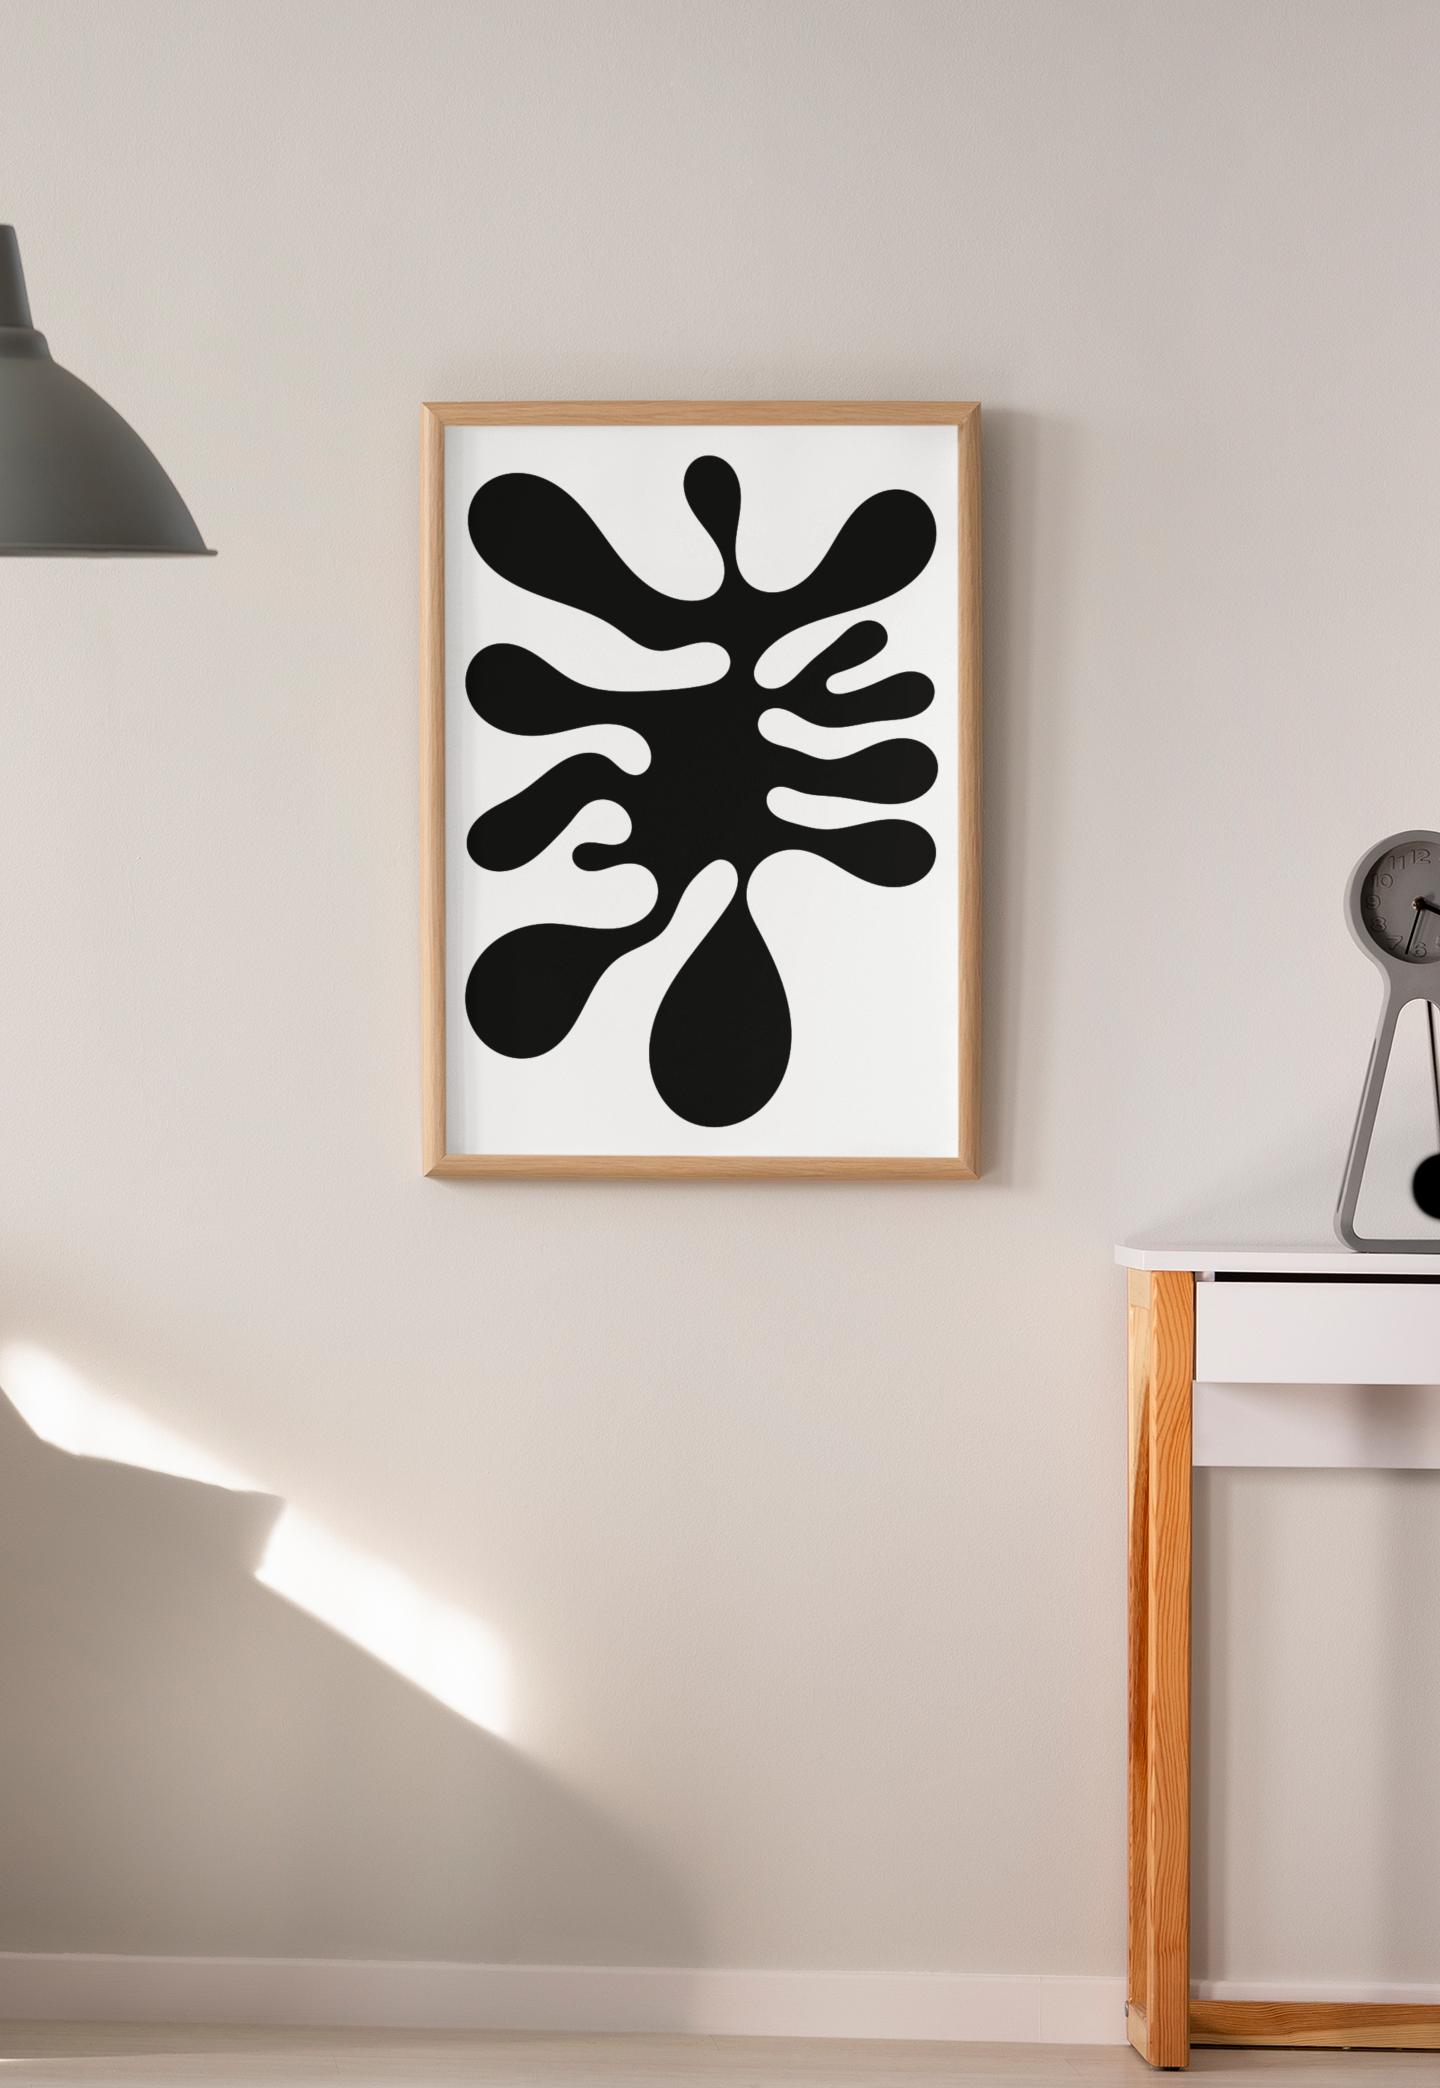 Abstract Wall Art Organic Shapes Nature Art Matisse Inspired Wall Decor Printable Art Art Print Downloadable Design Digital Download Abstract Wall Art Printable Art Nature Art